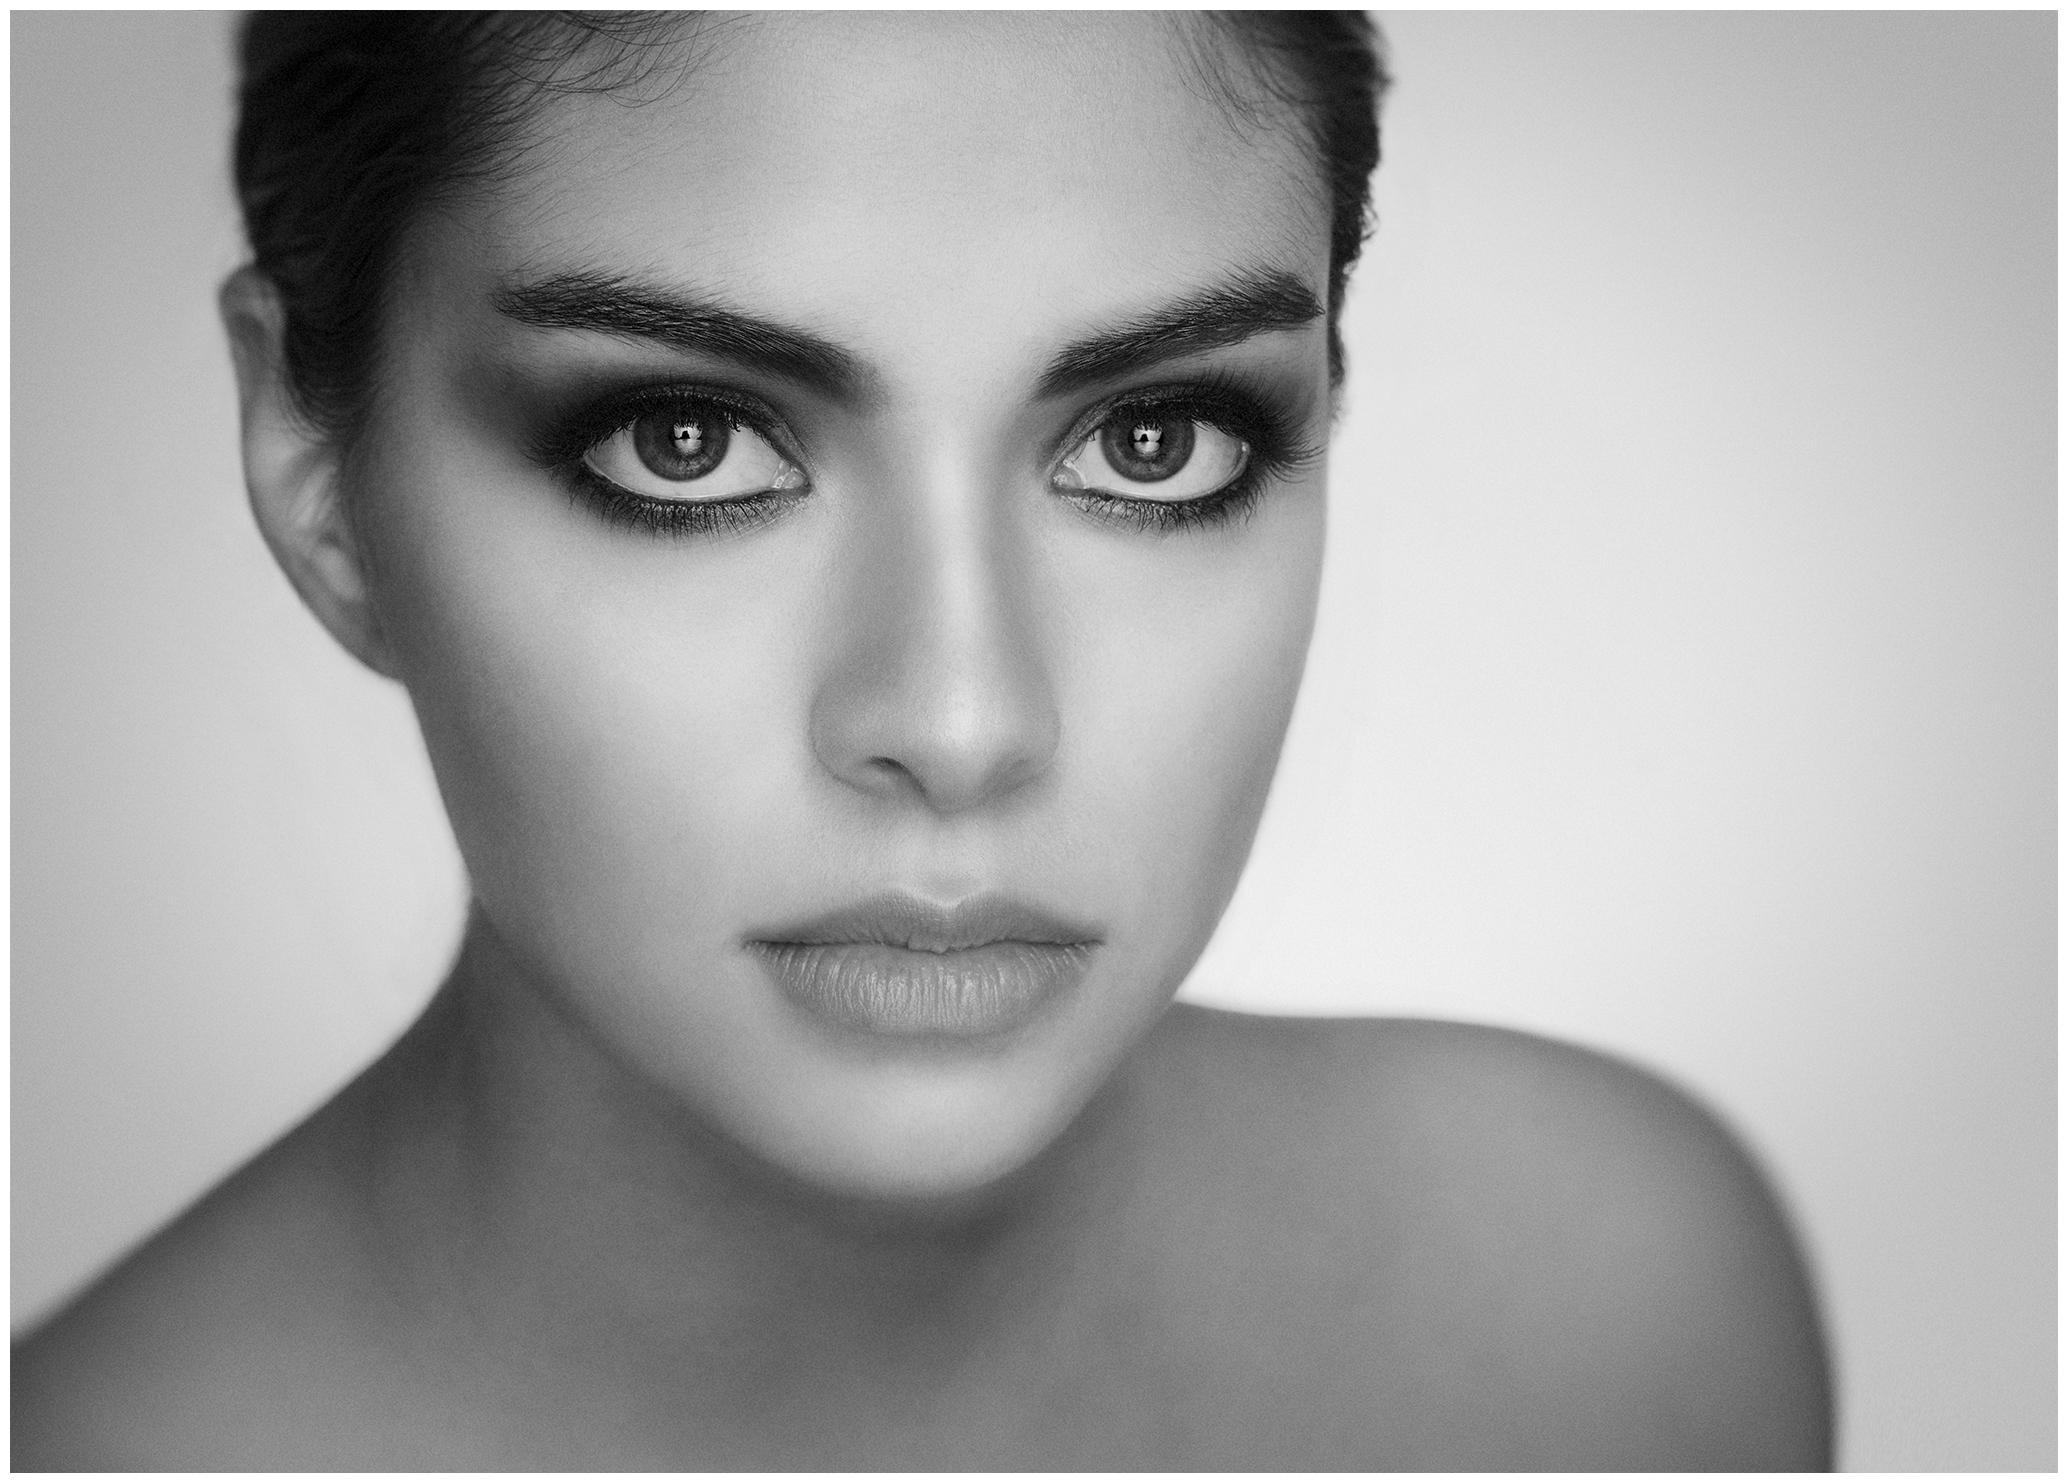 Portrait of Mexican Model Fernanda Paz Ojeda by Richard Cawood